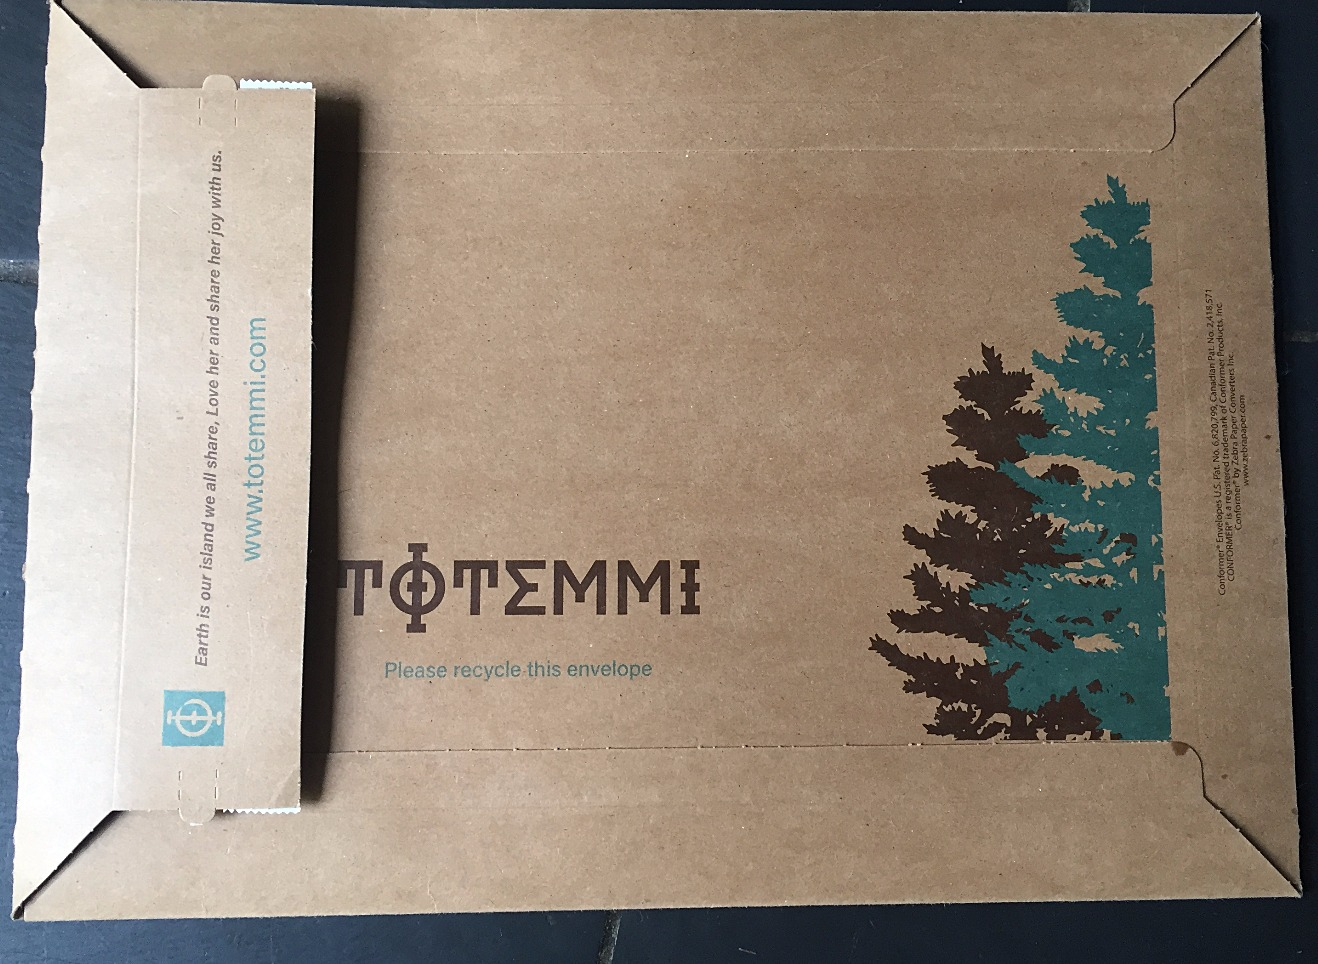 Totemmi Mailer Branding & Color